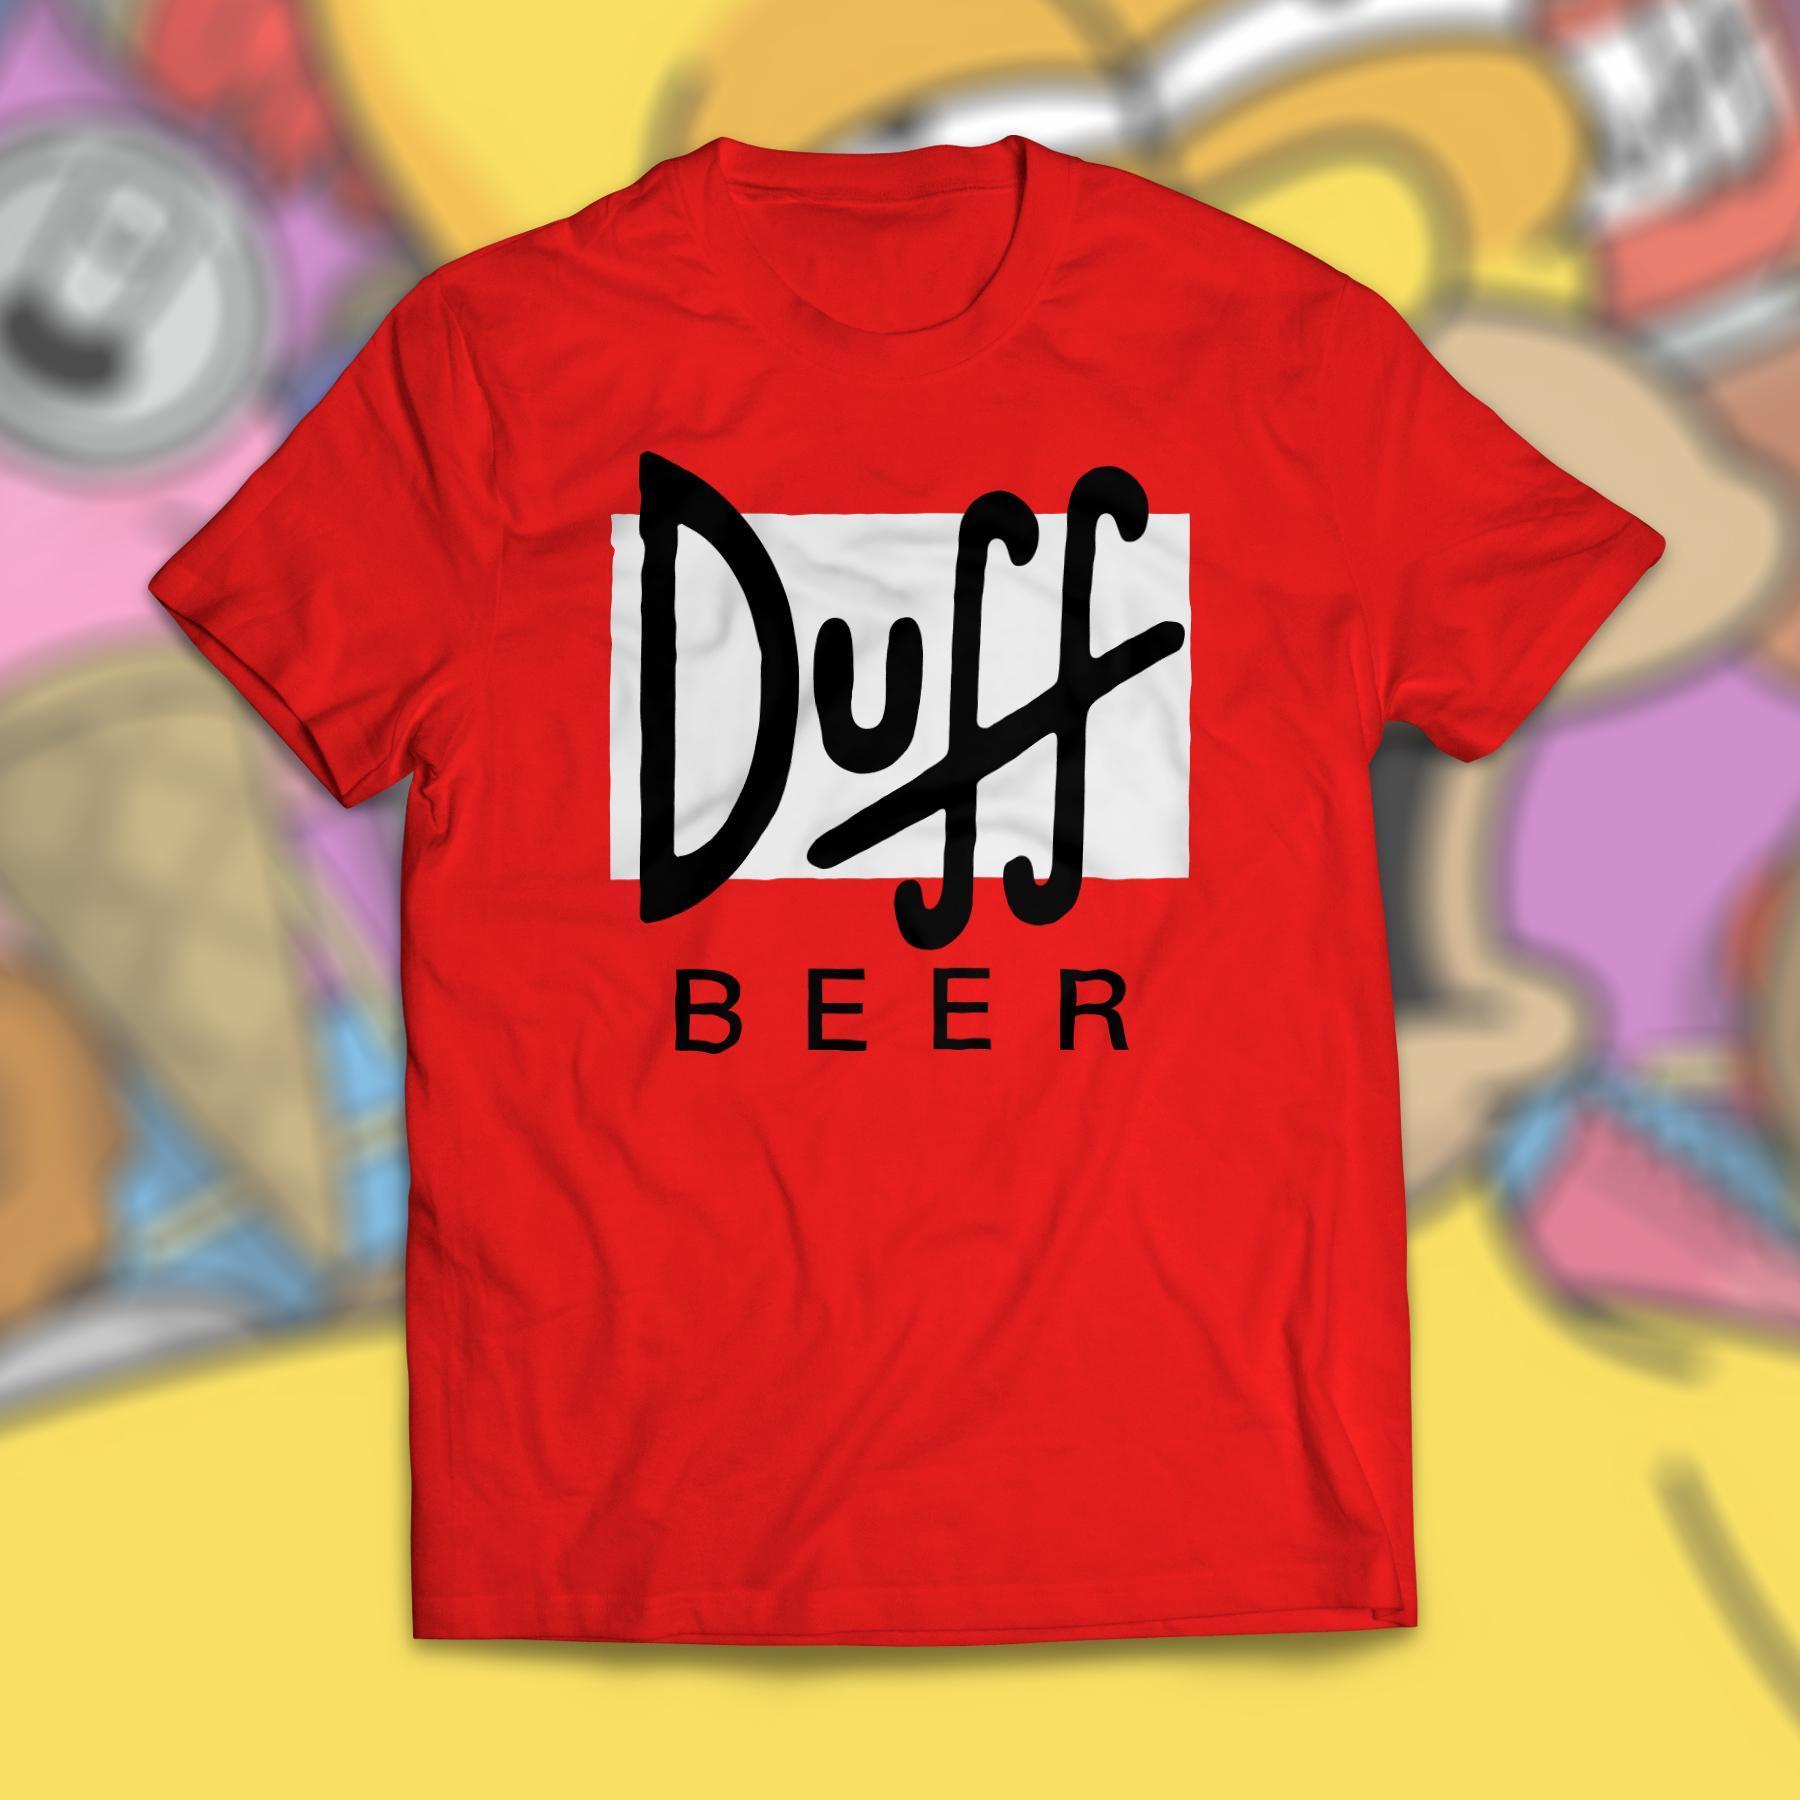 b8410ede7 Camiseta Duff Beer Os Simpsons Masculina - Teo Shop